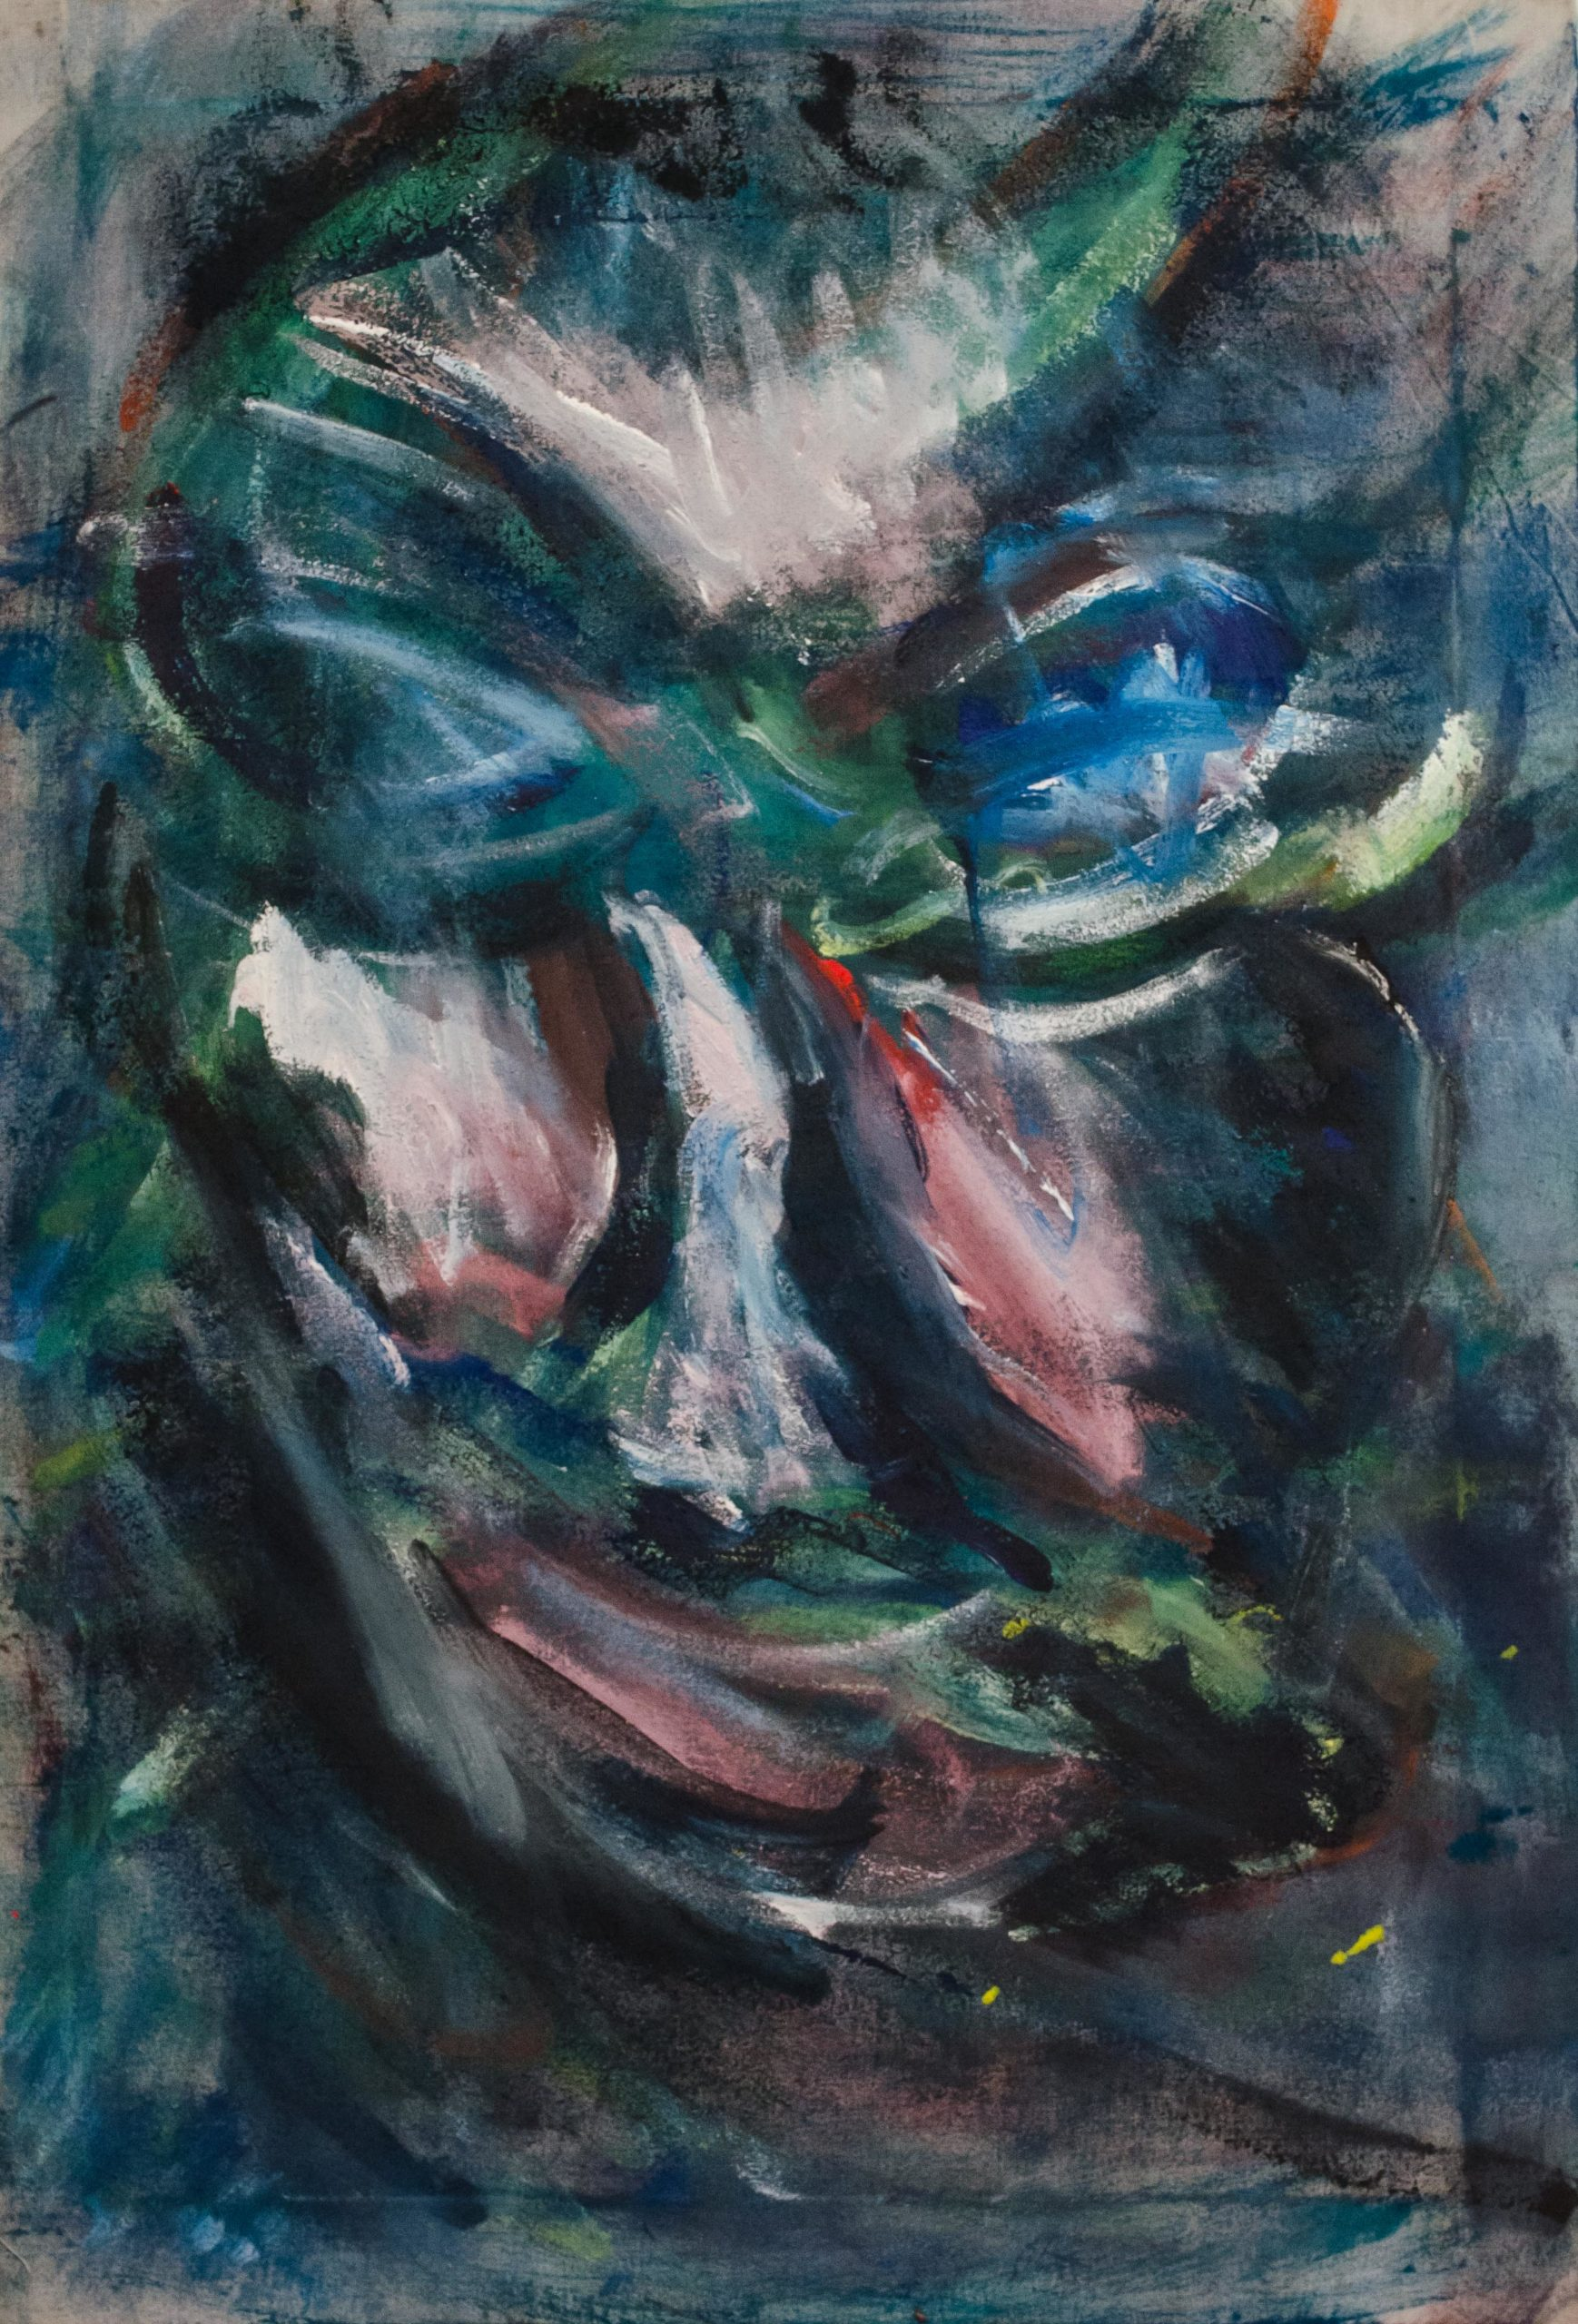 Selfportrait - Acrylic col - 52x77cm